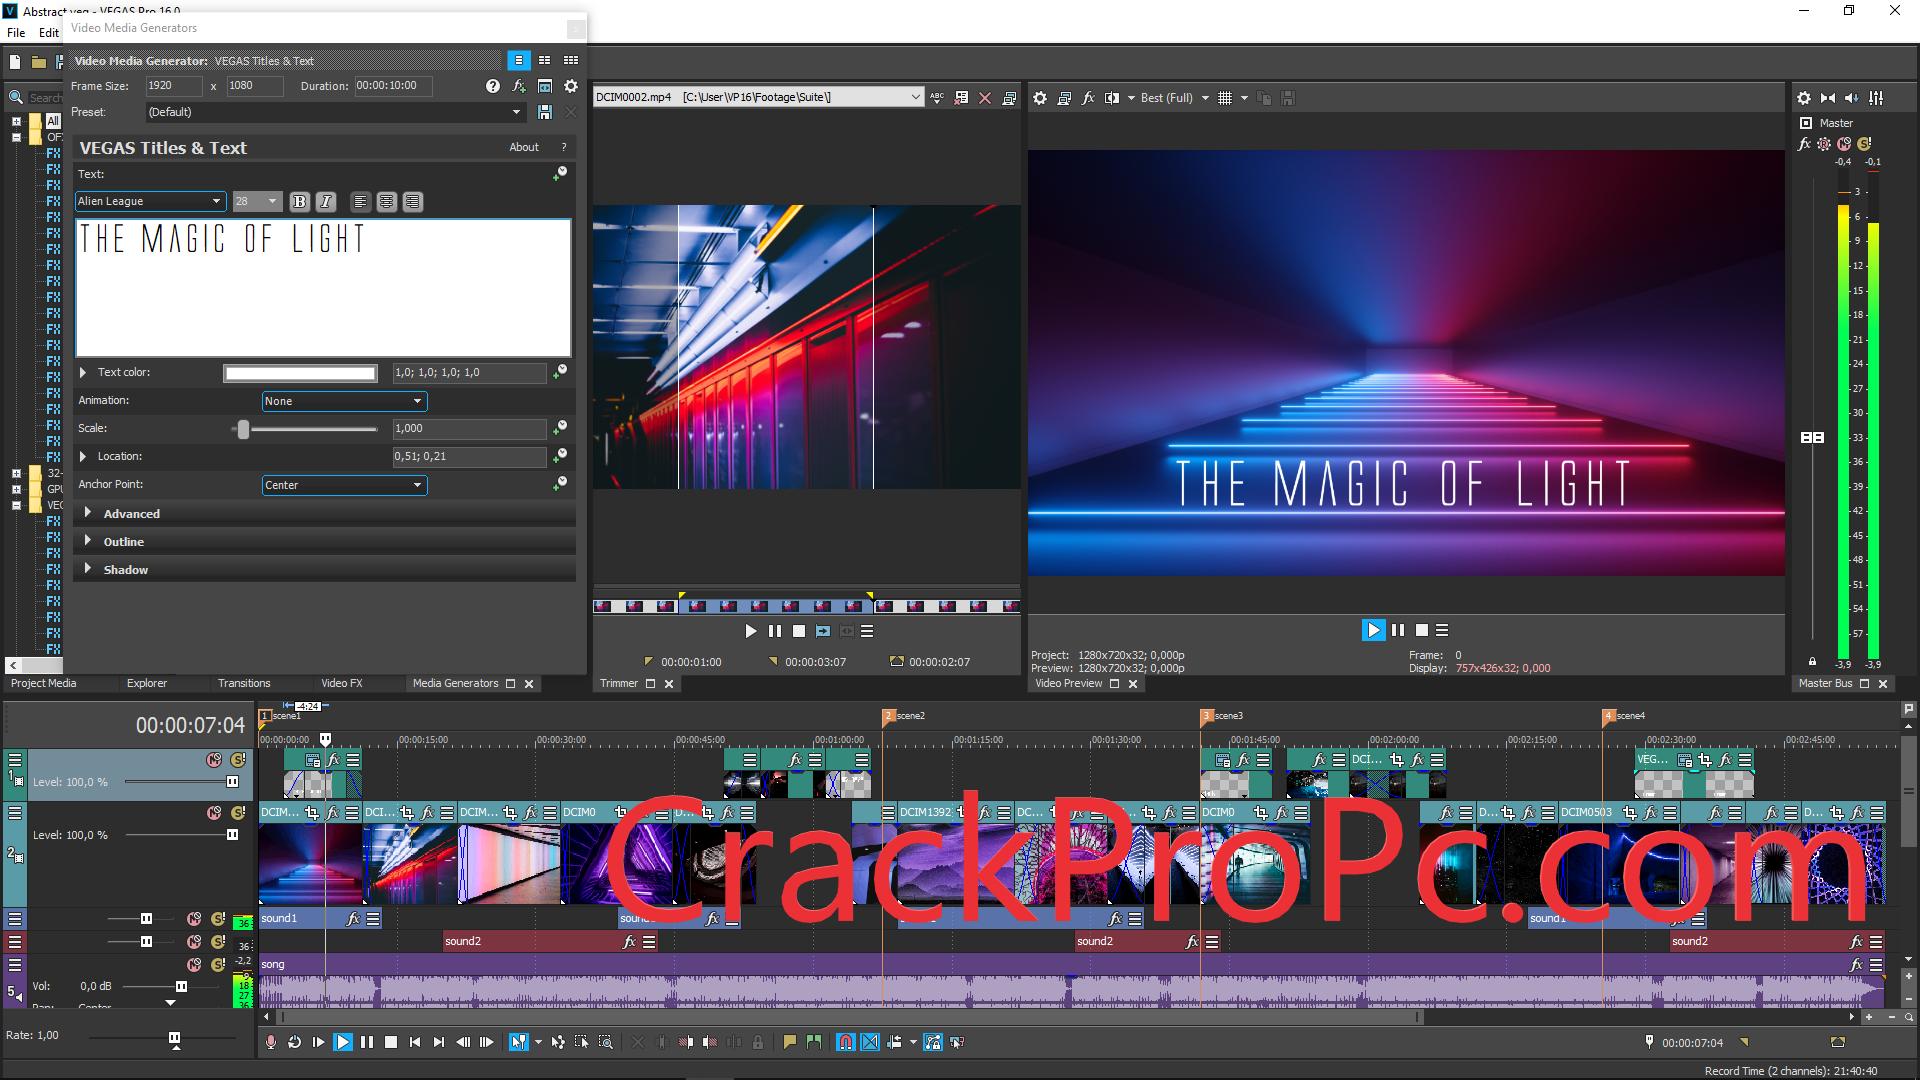 Sony Vegas Pro 20 Crack 2022 Serial Number Full Free Download